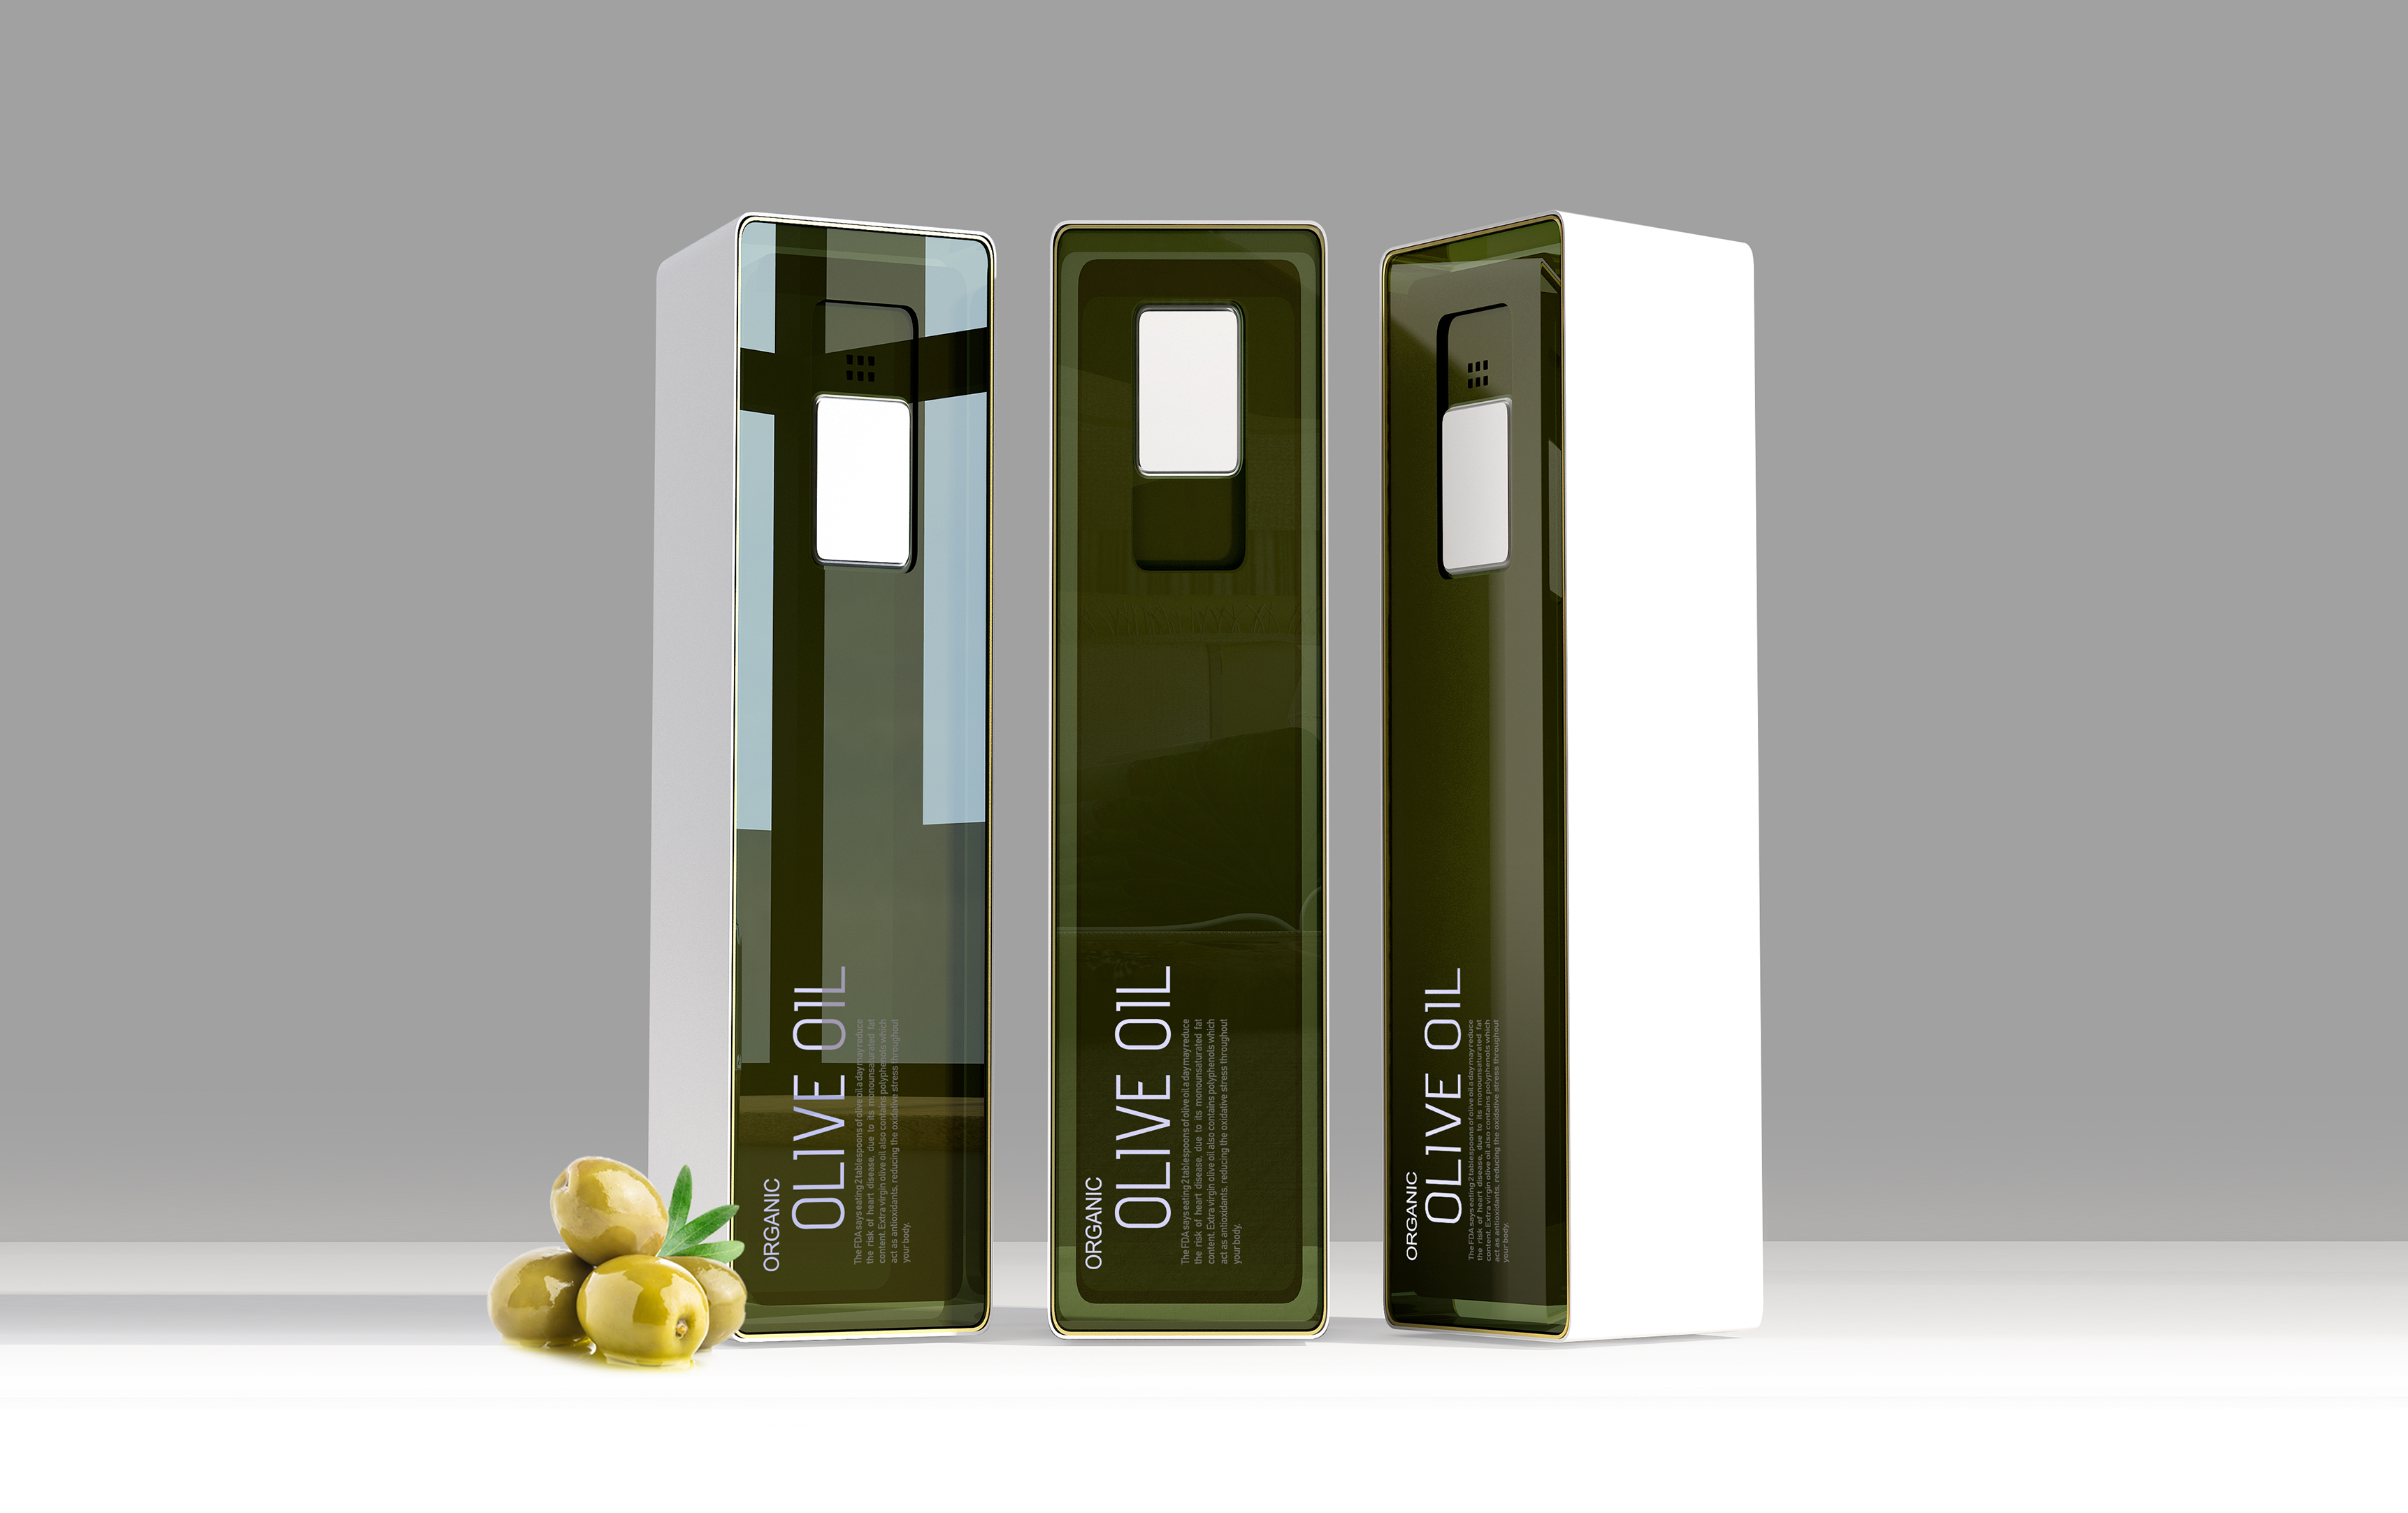 Taha Fakouri Creates New Olive Oil Concept Bottle Design